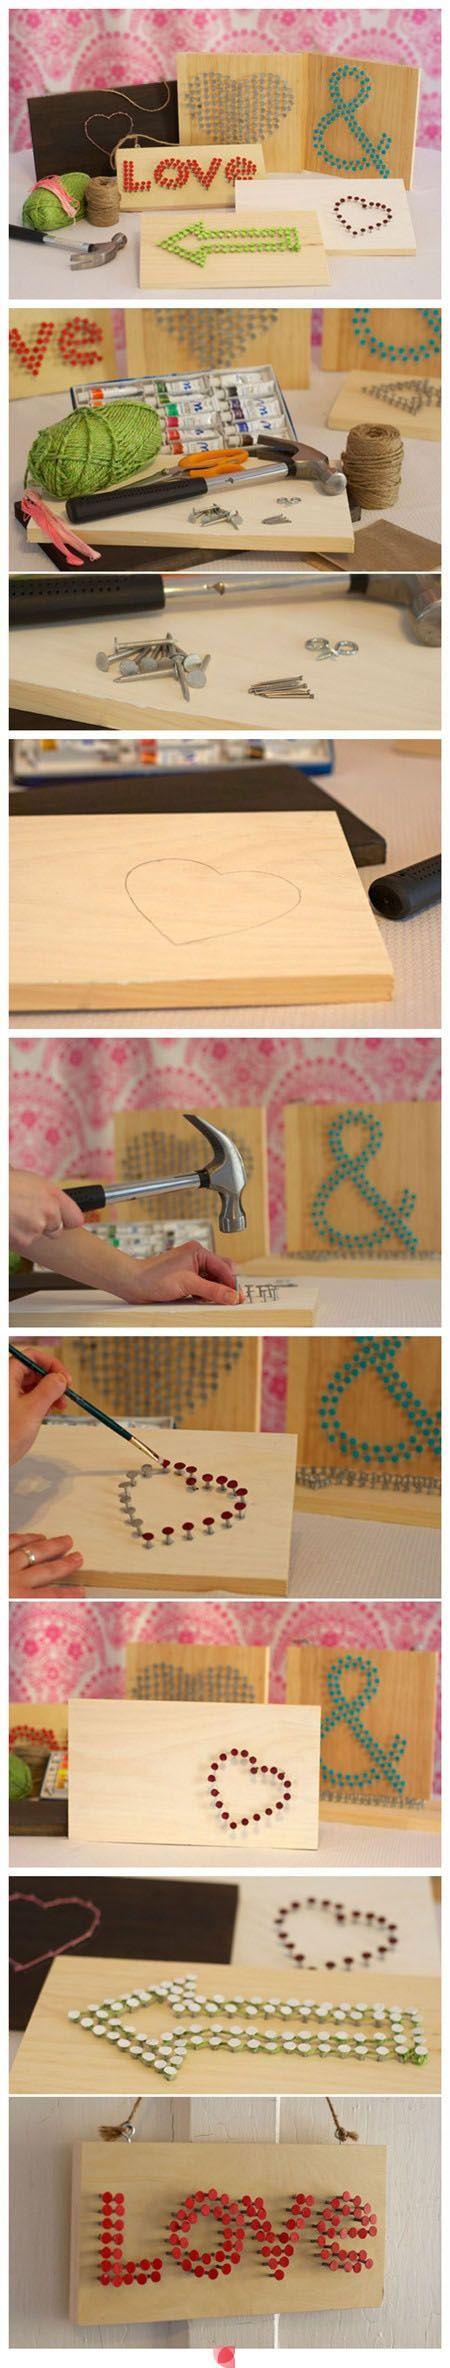 DIY Wood, Yarn and Nail Art - Ideeën voor knutsels | Pinterest ...